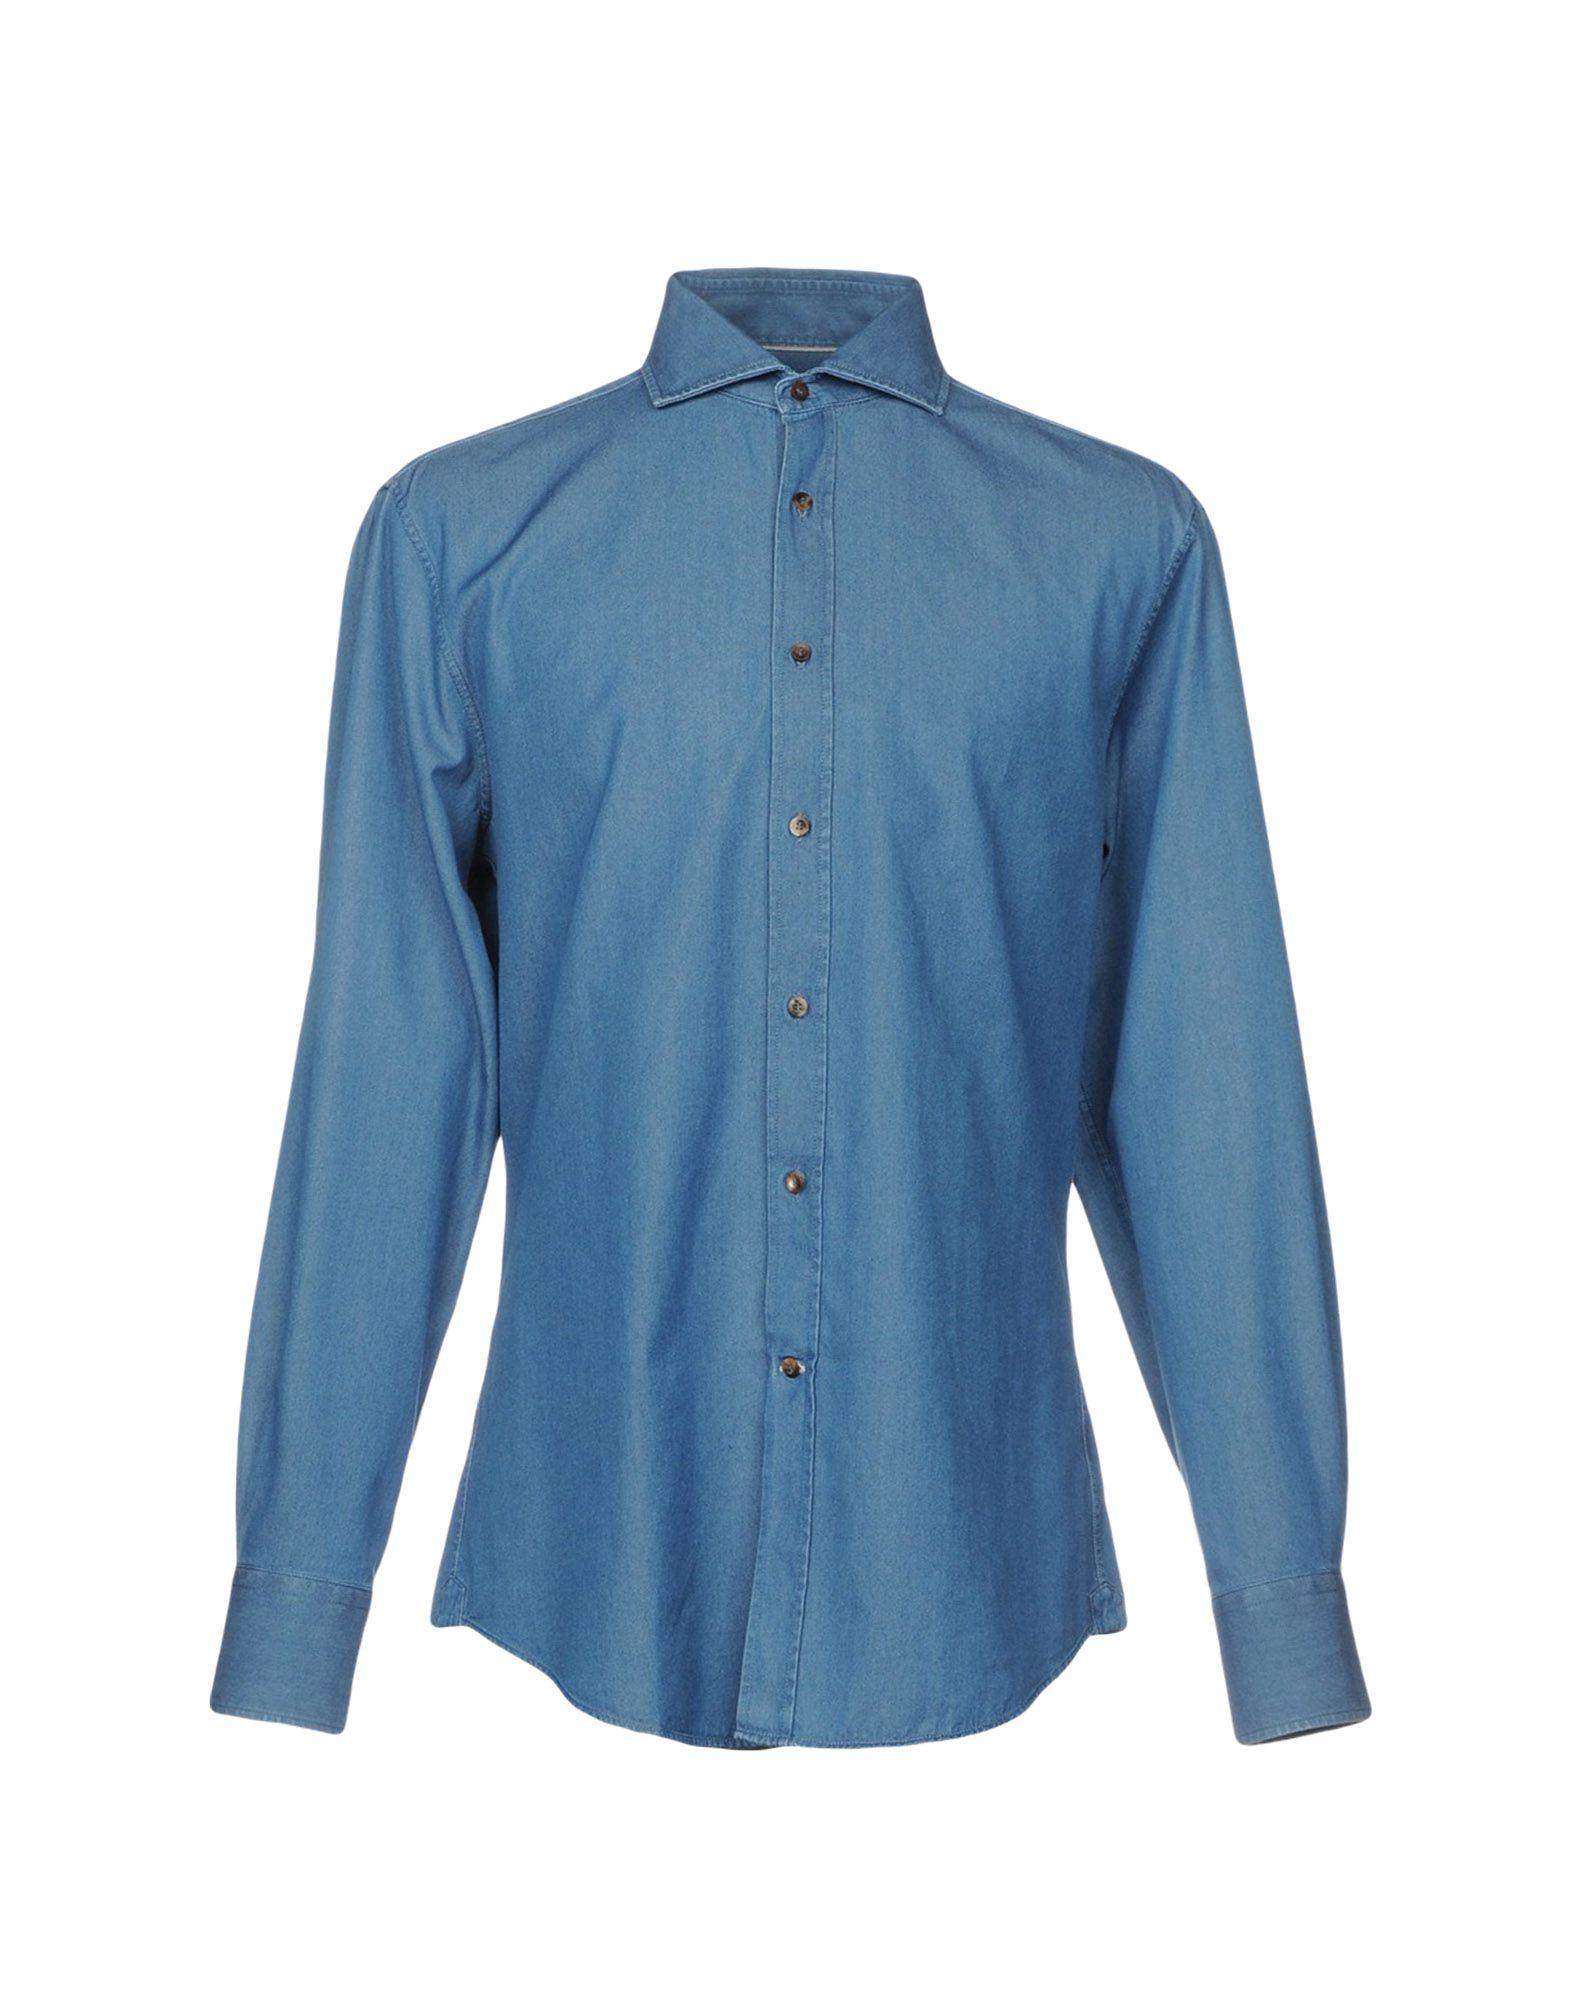 BRUNELLO CUCINELLI Джинсовая рубашка рубашка джинсовая 3 12 лет